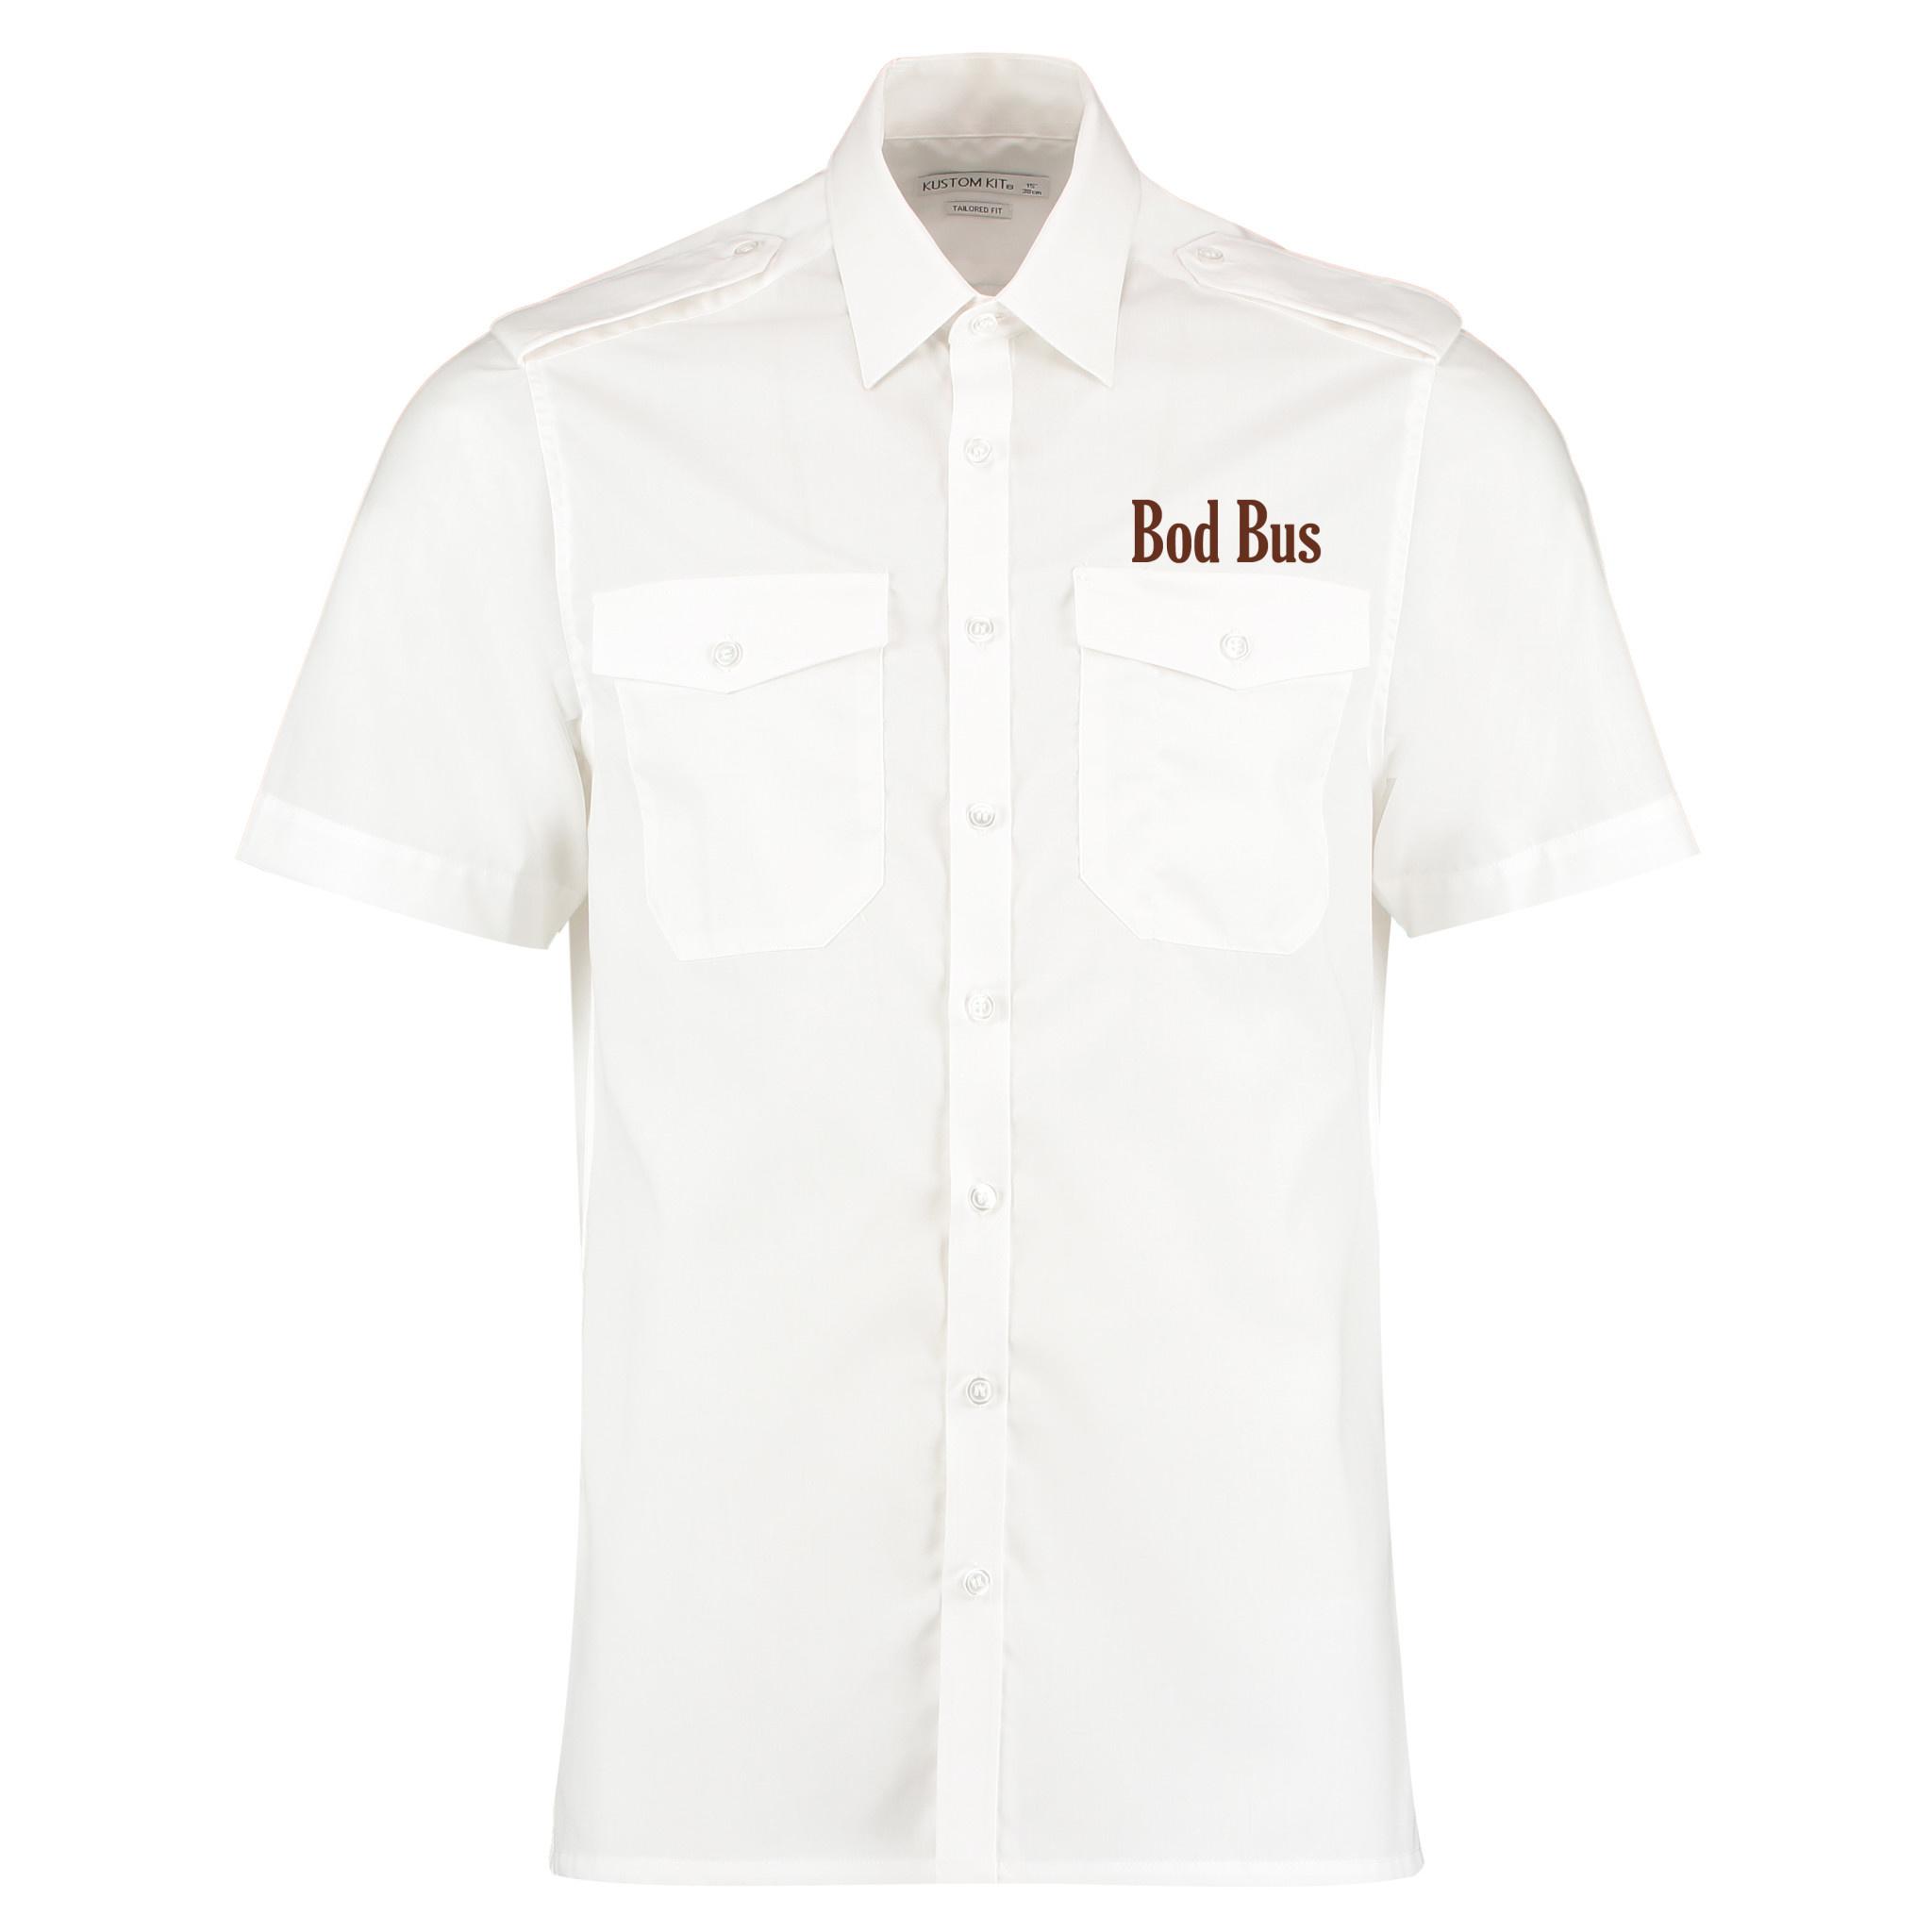 Bod Bus Adults Pilot Shirt